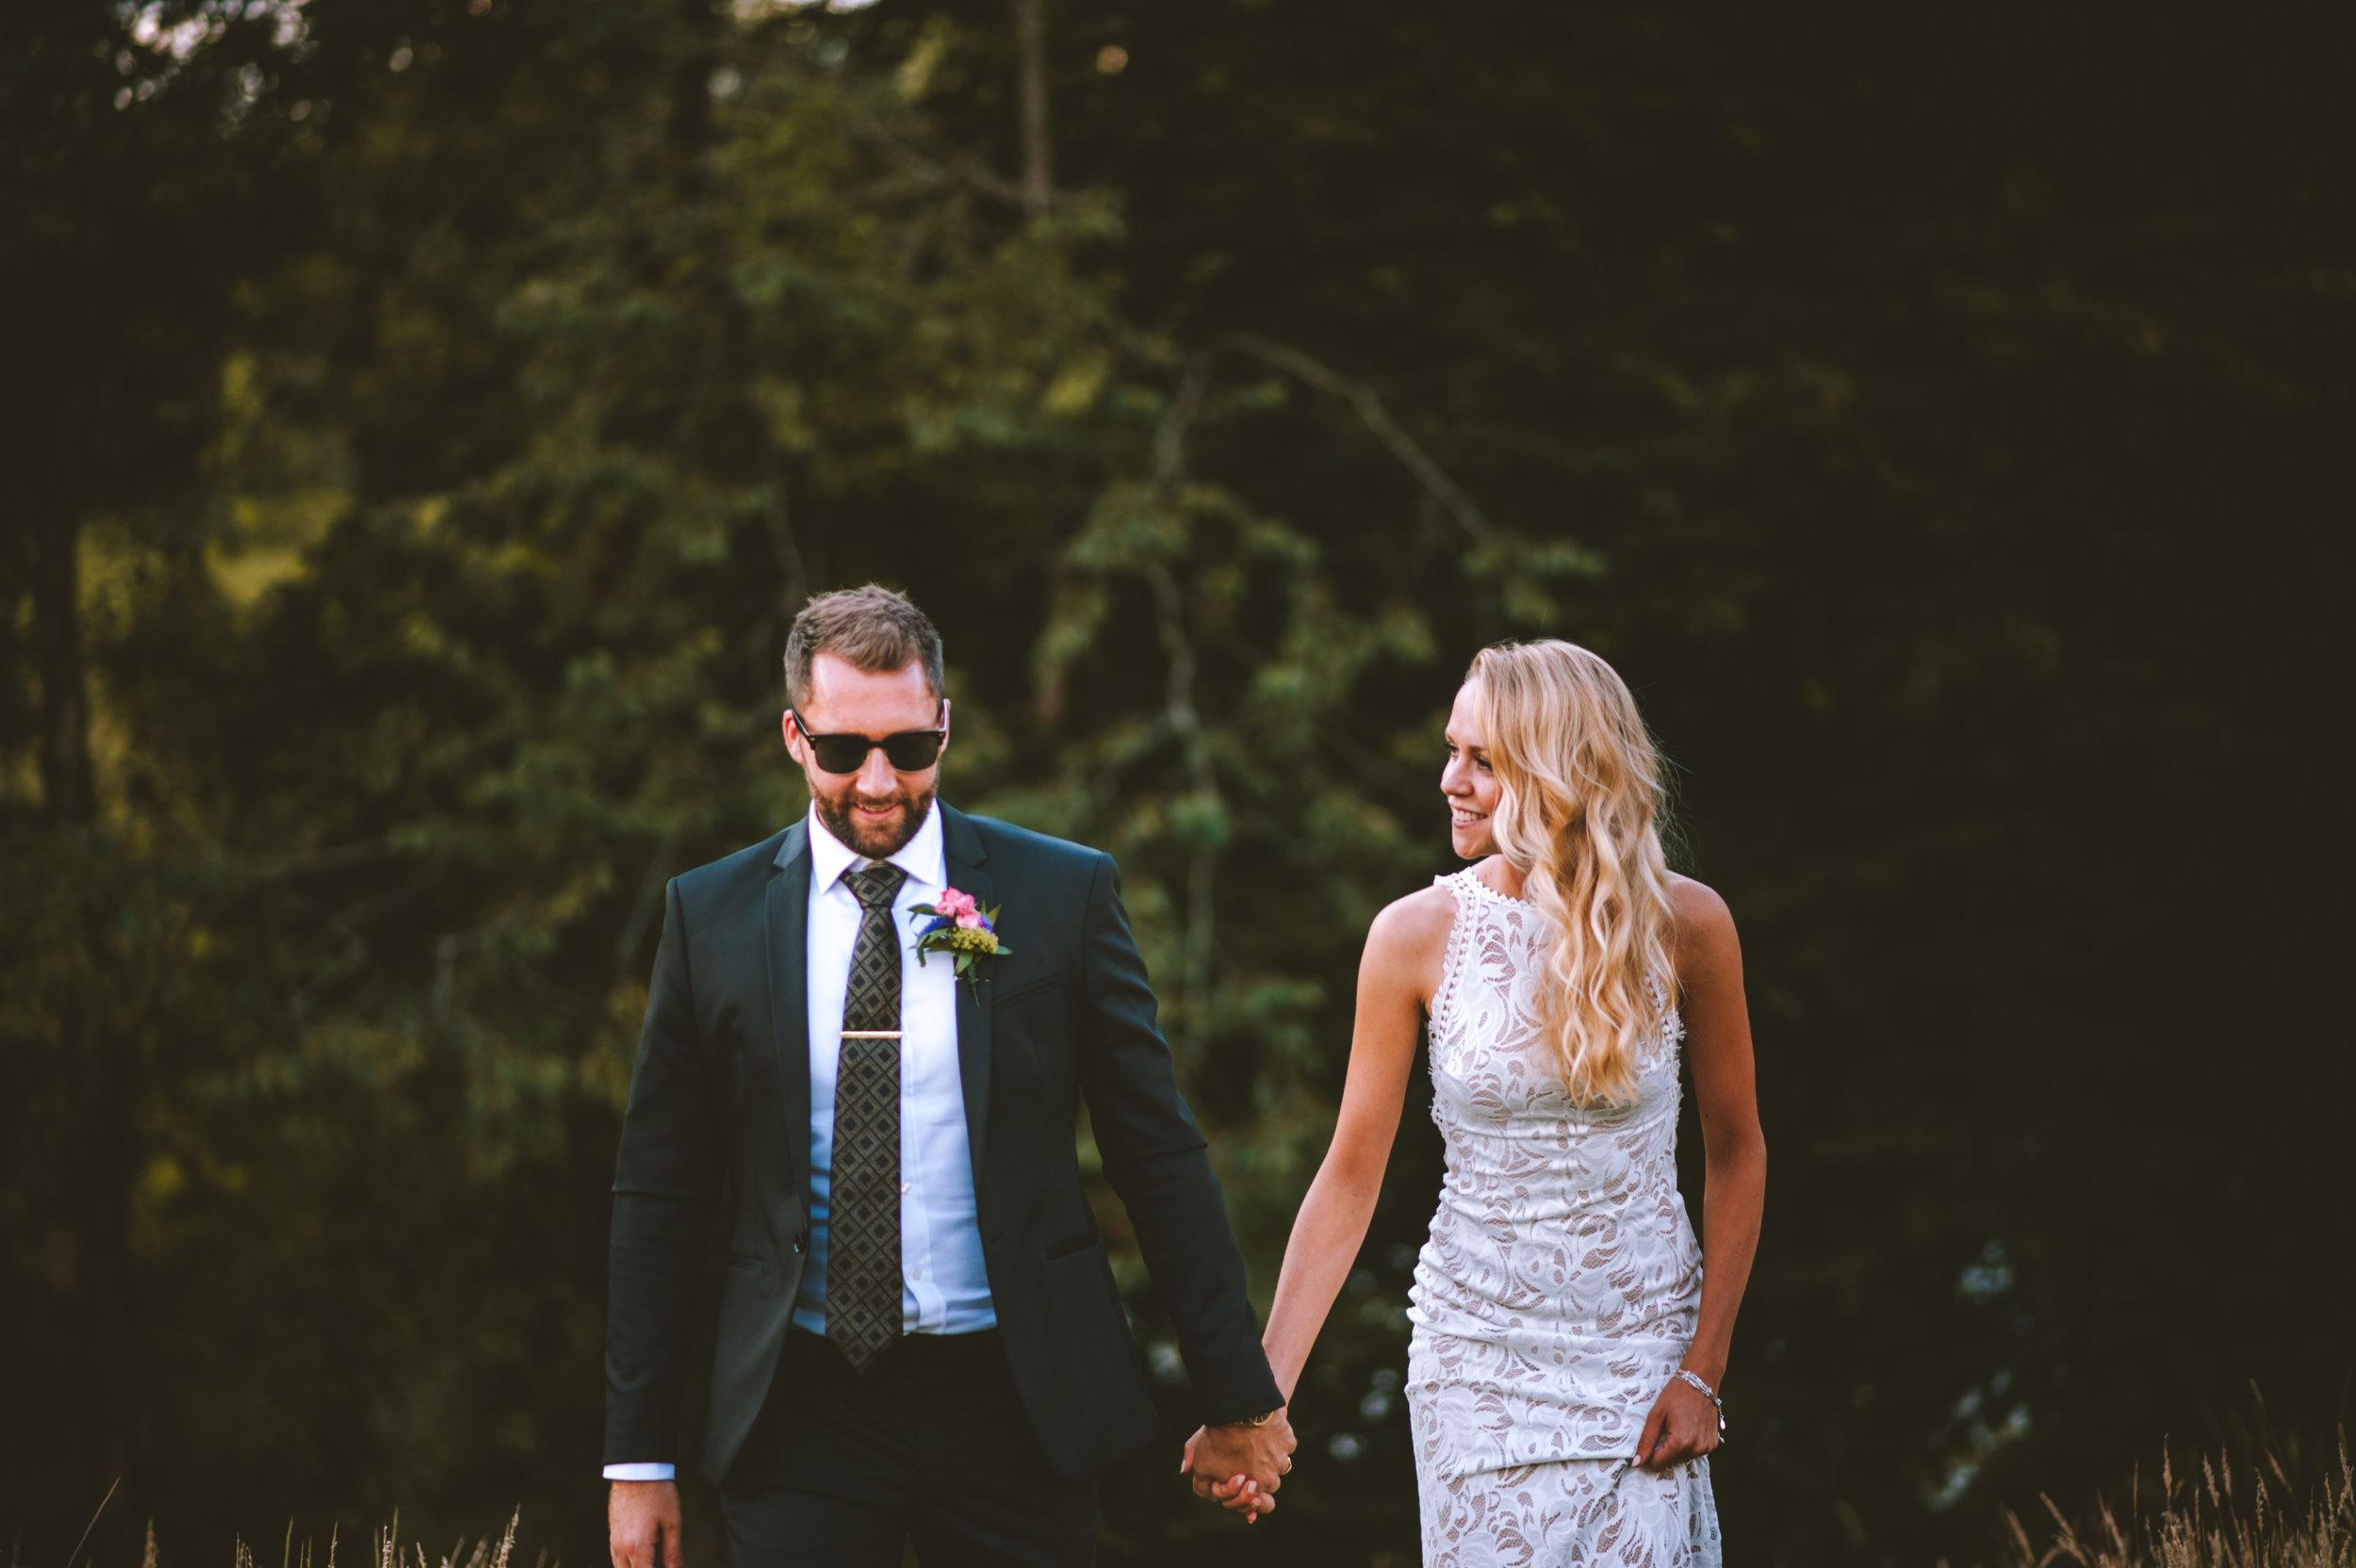 deers-leap-wedding-photographer-117.jpg